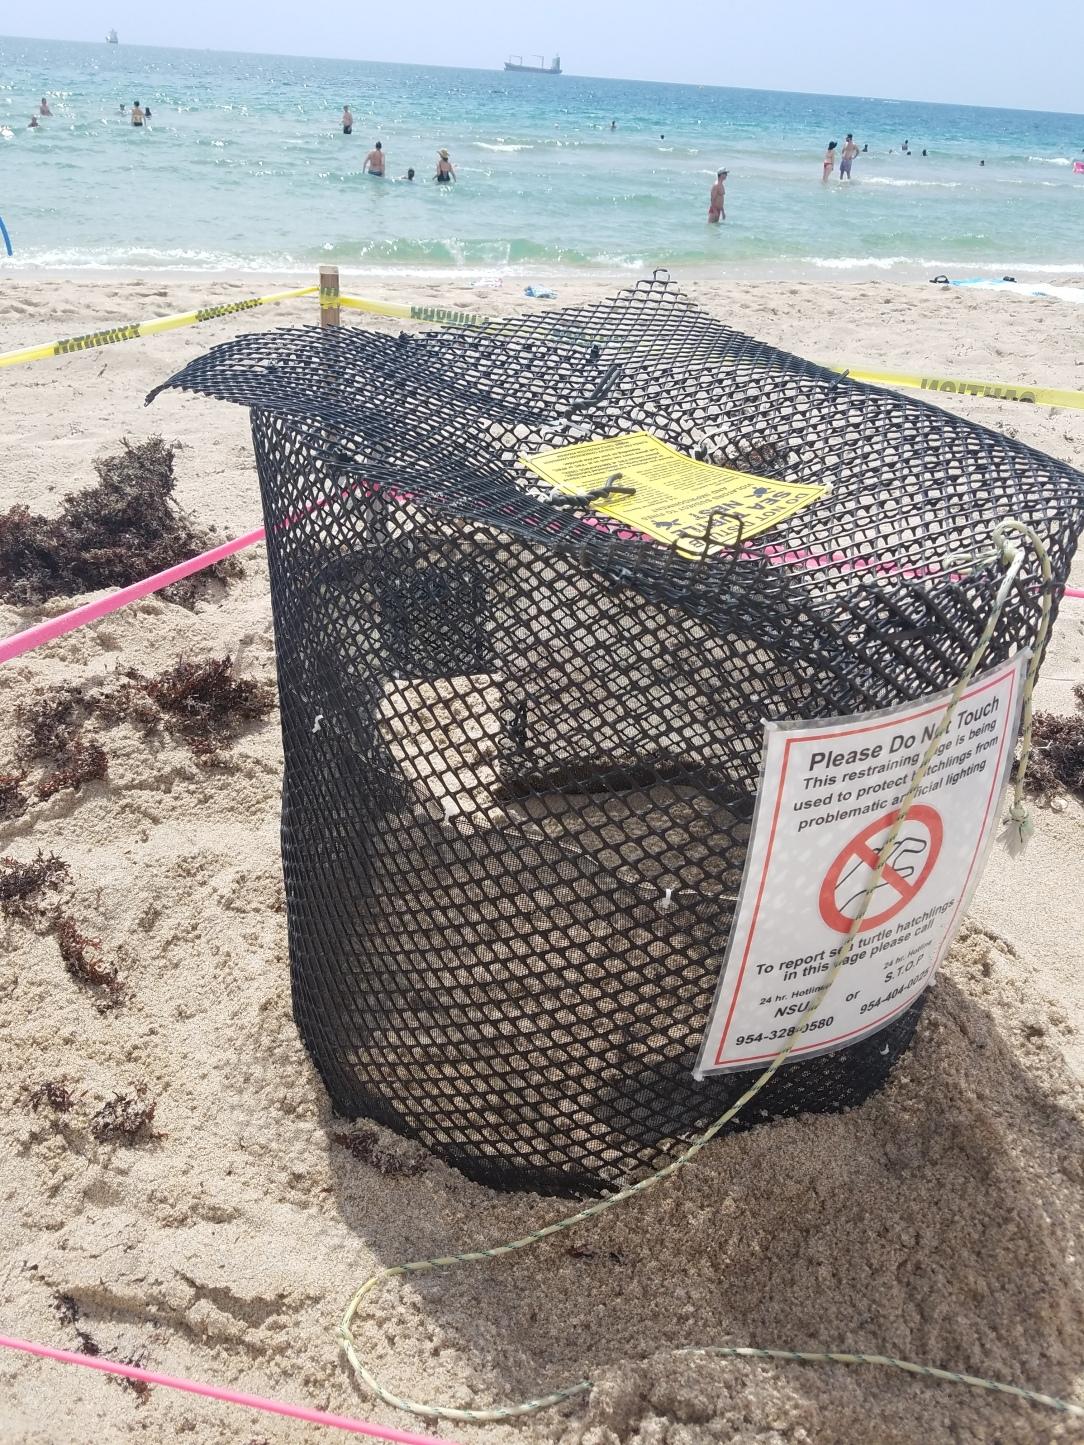 Broward County Sea Turtle Conservation Program Fort Lauderdale Florida